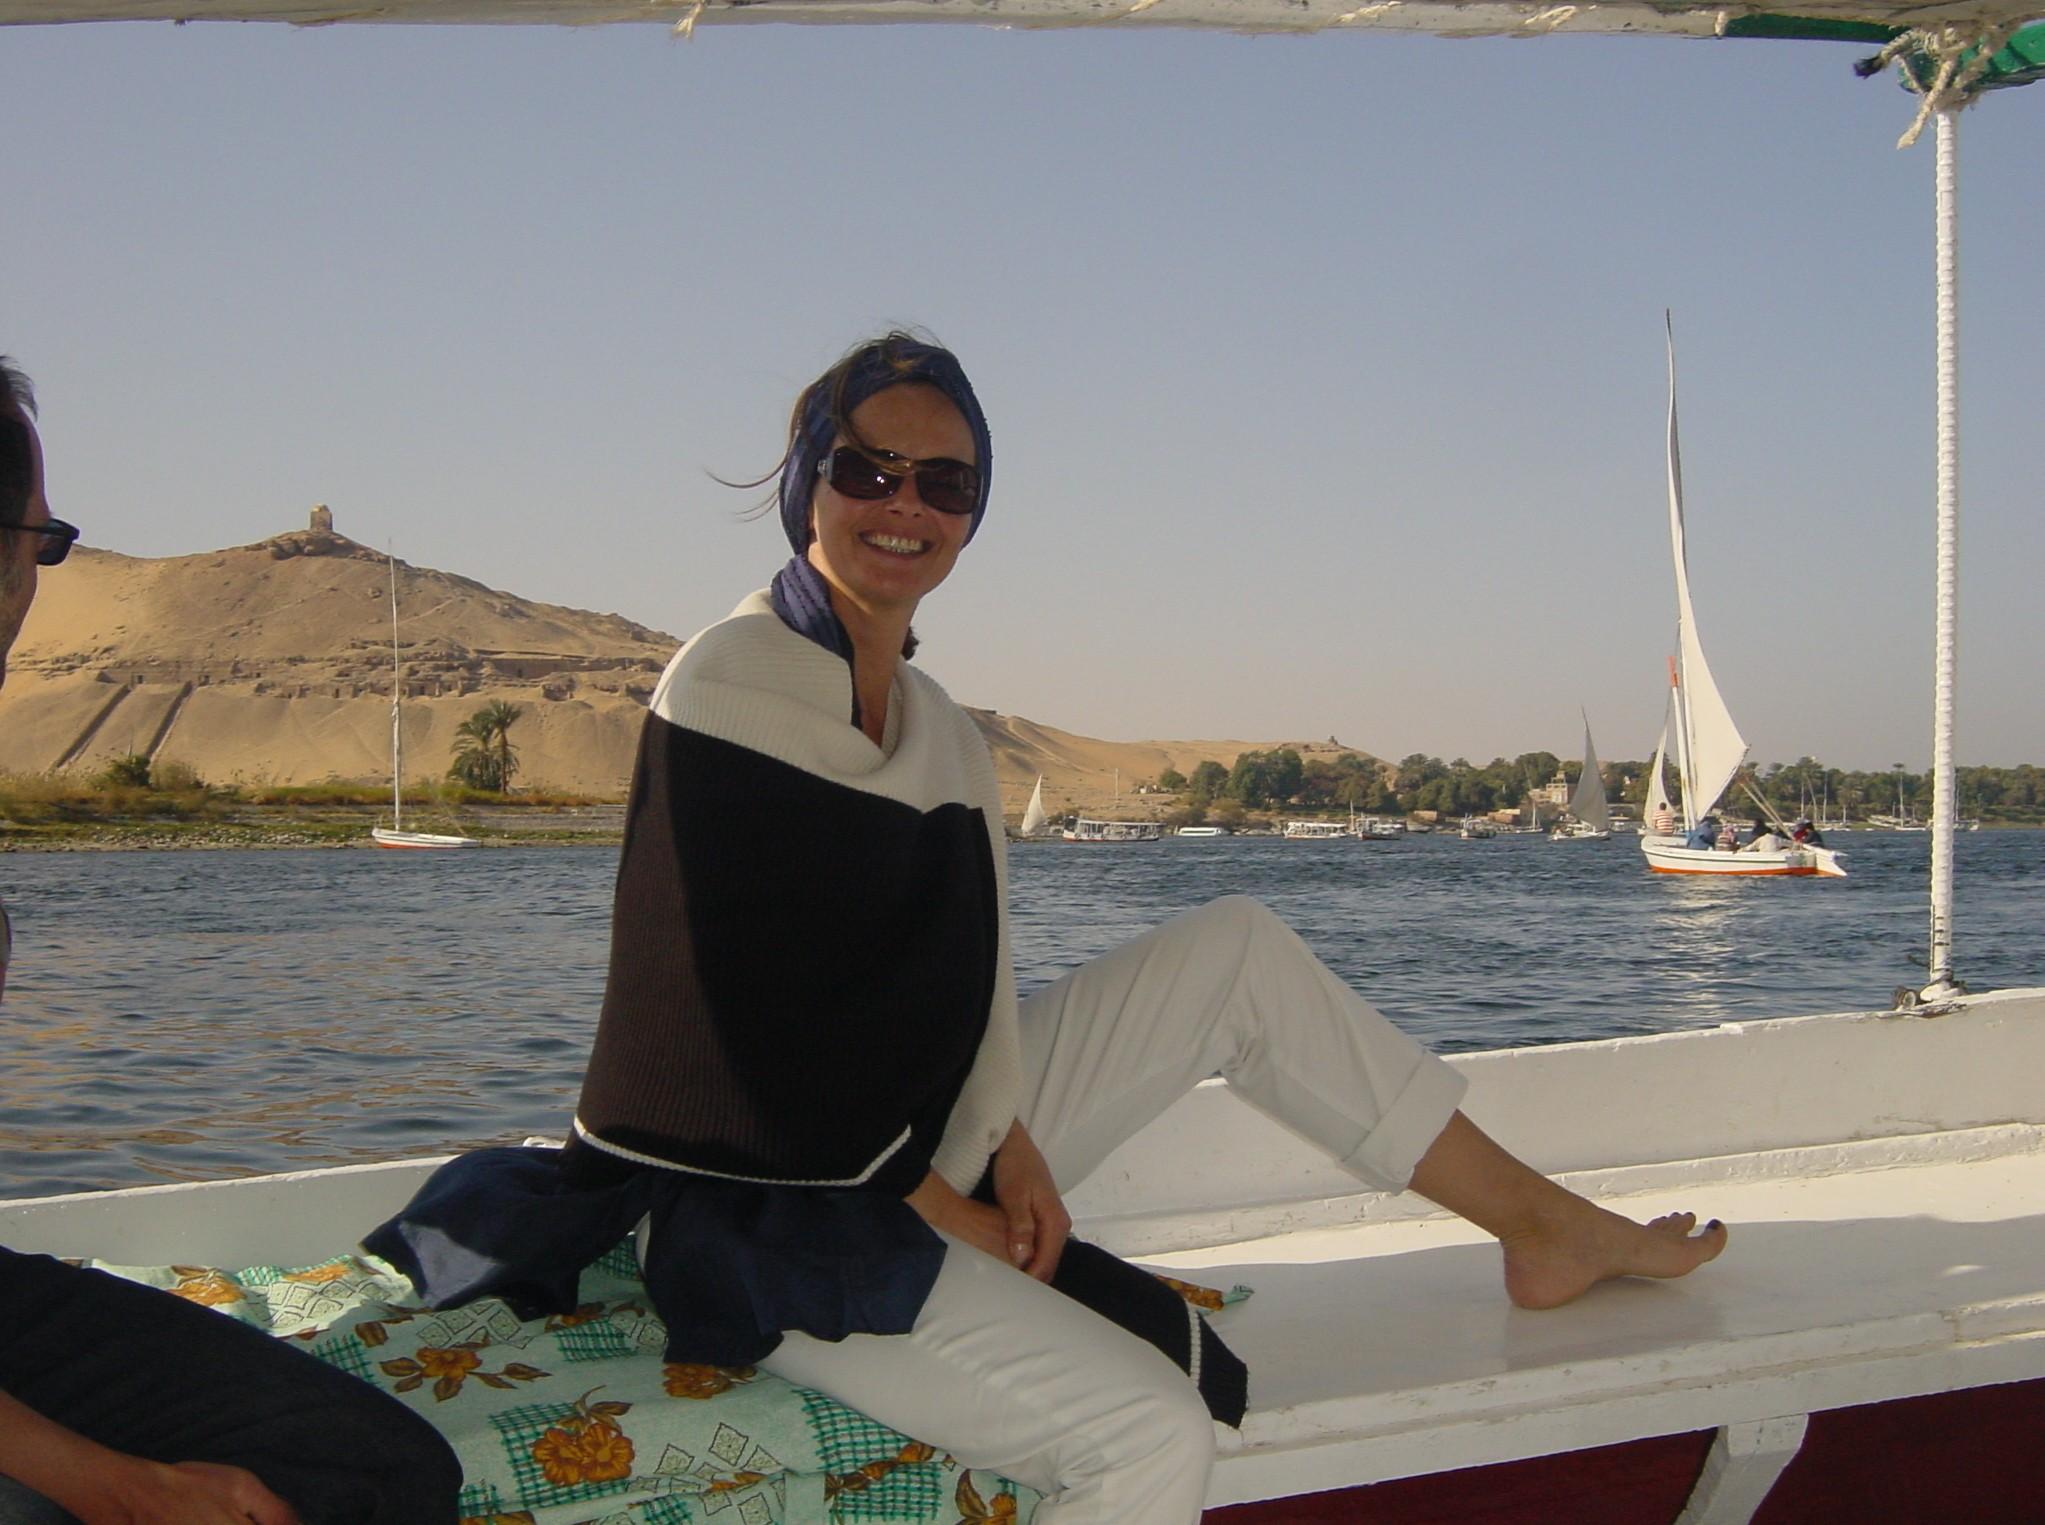 Auf dem Nil Assuan / Ägypten